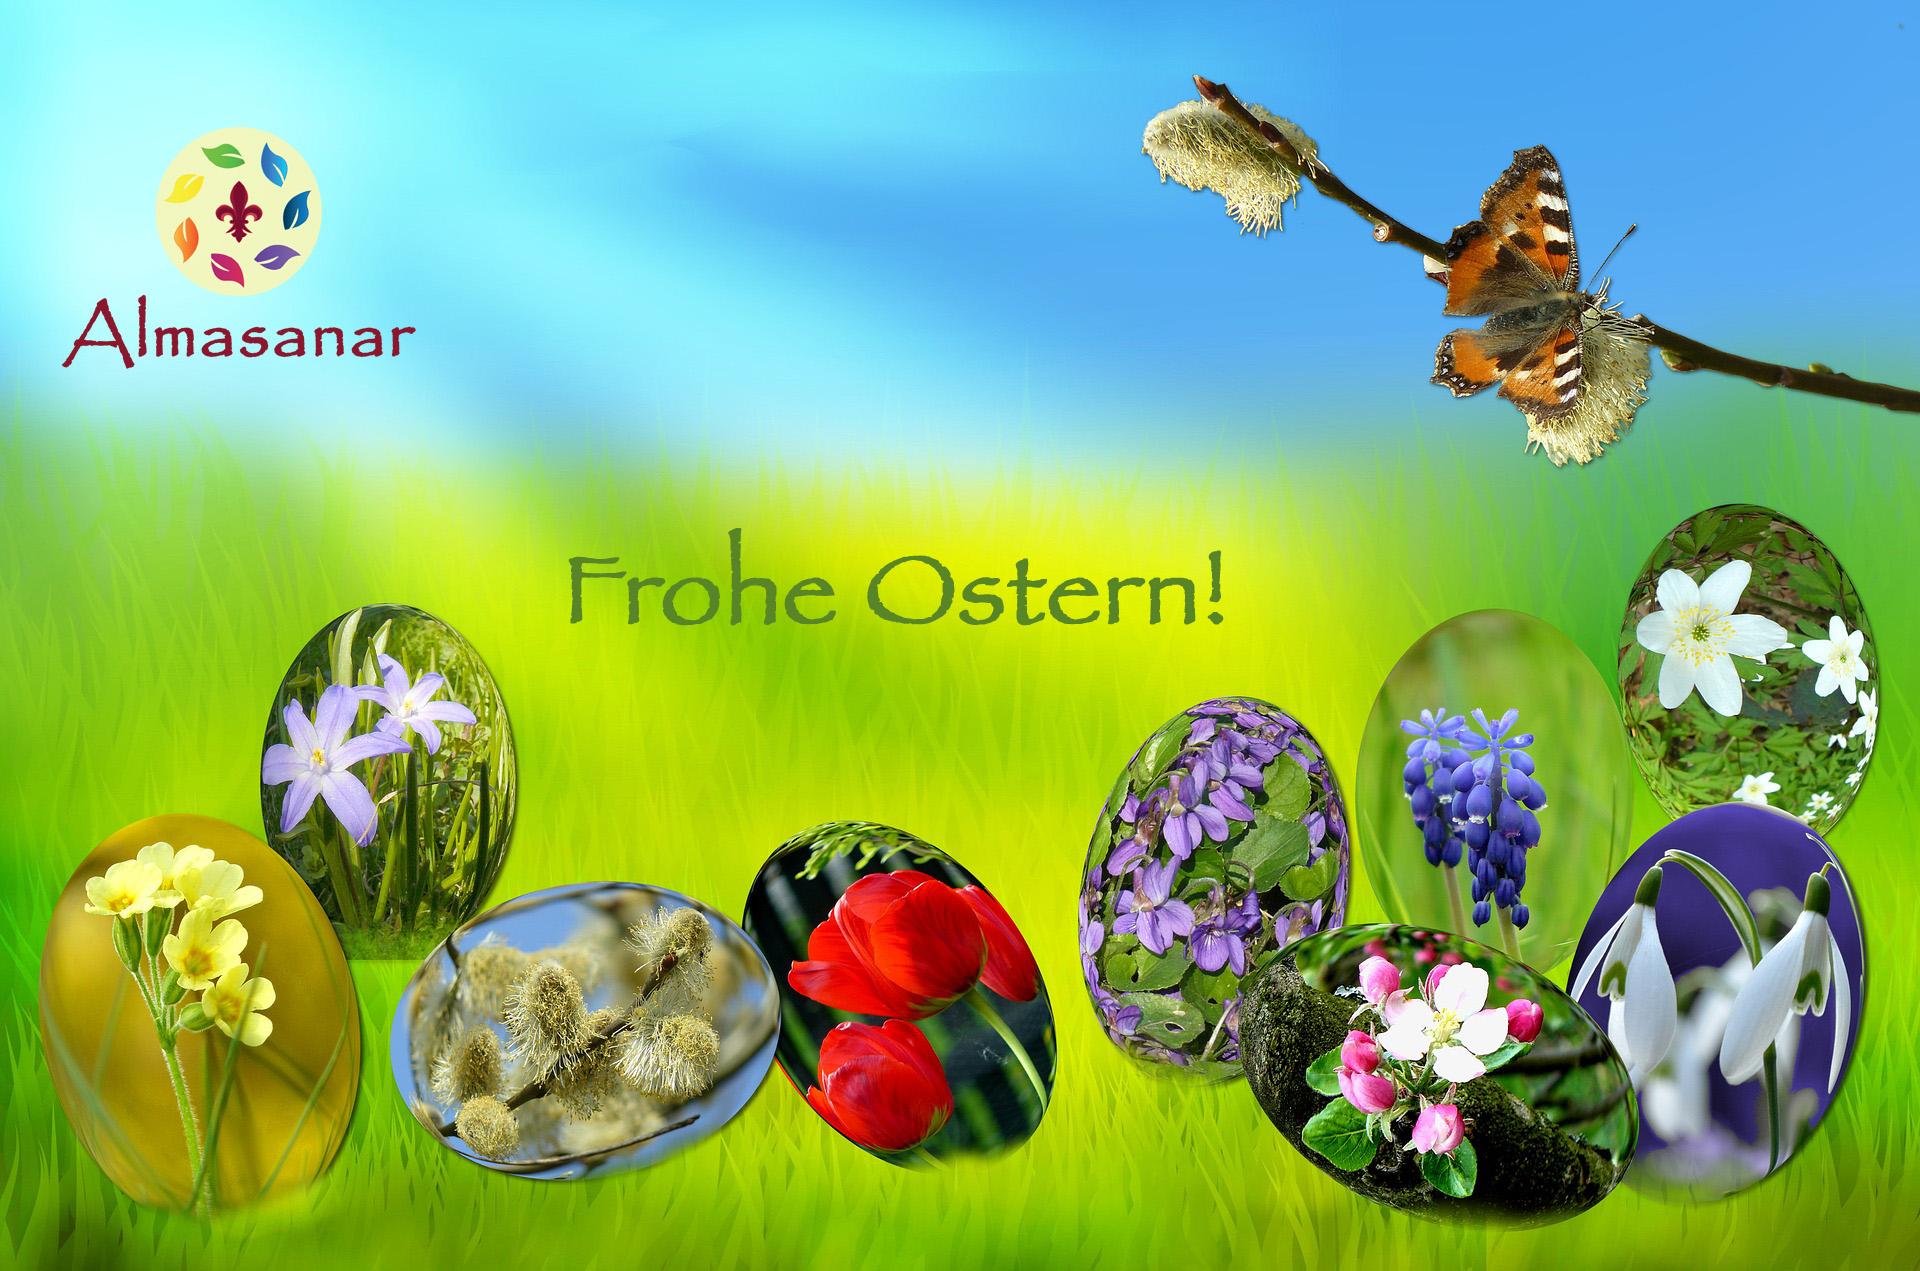 Ostern_Almasanar